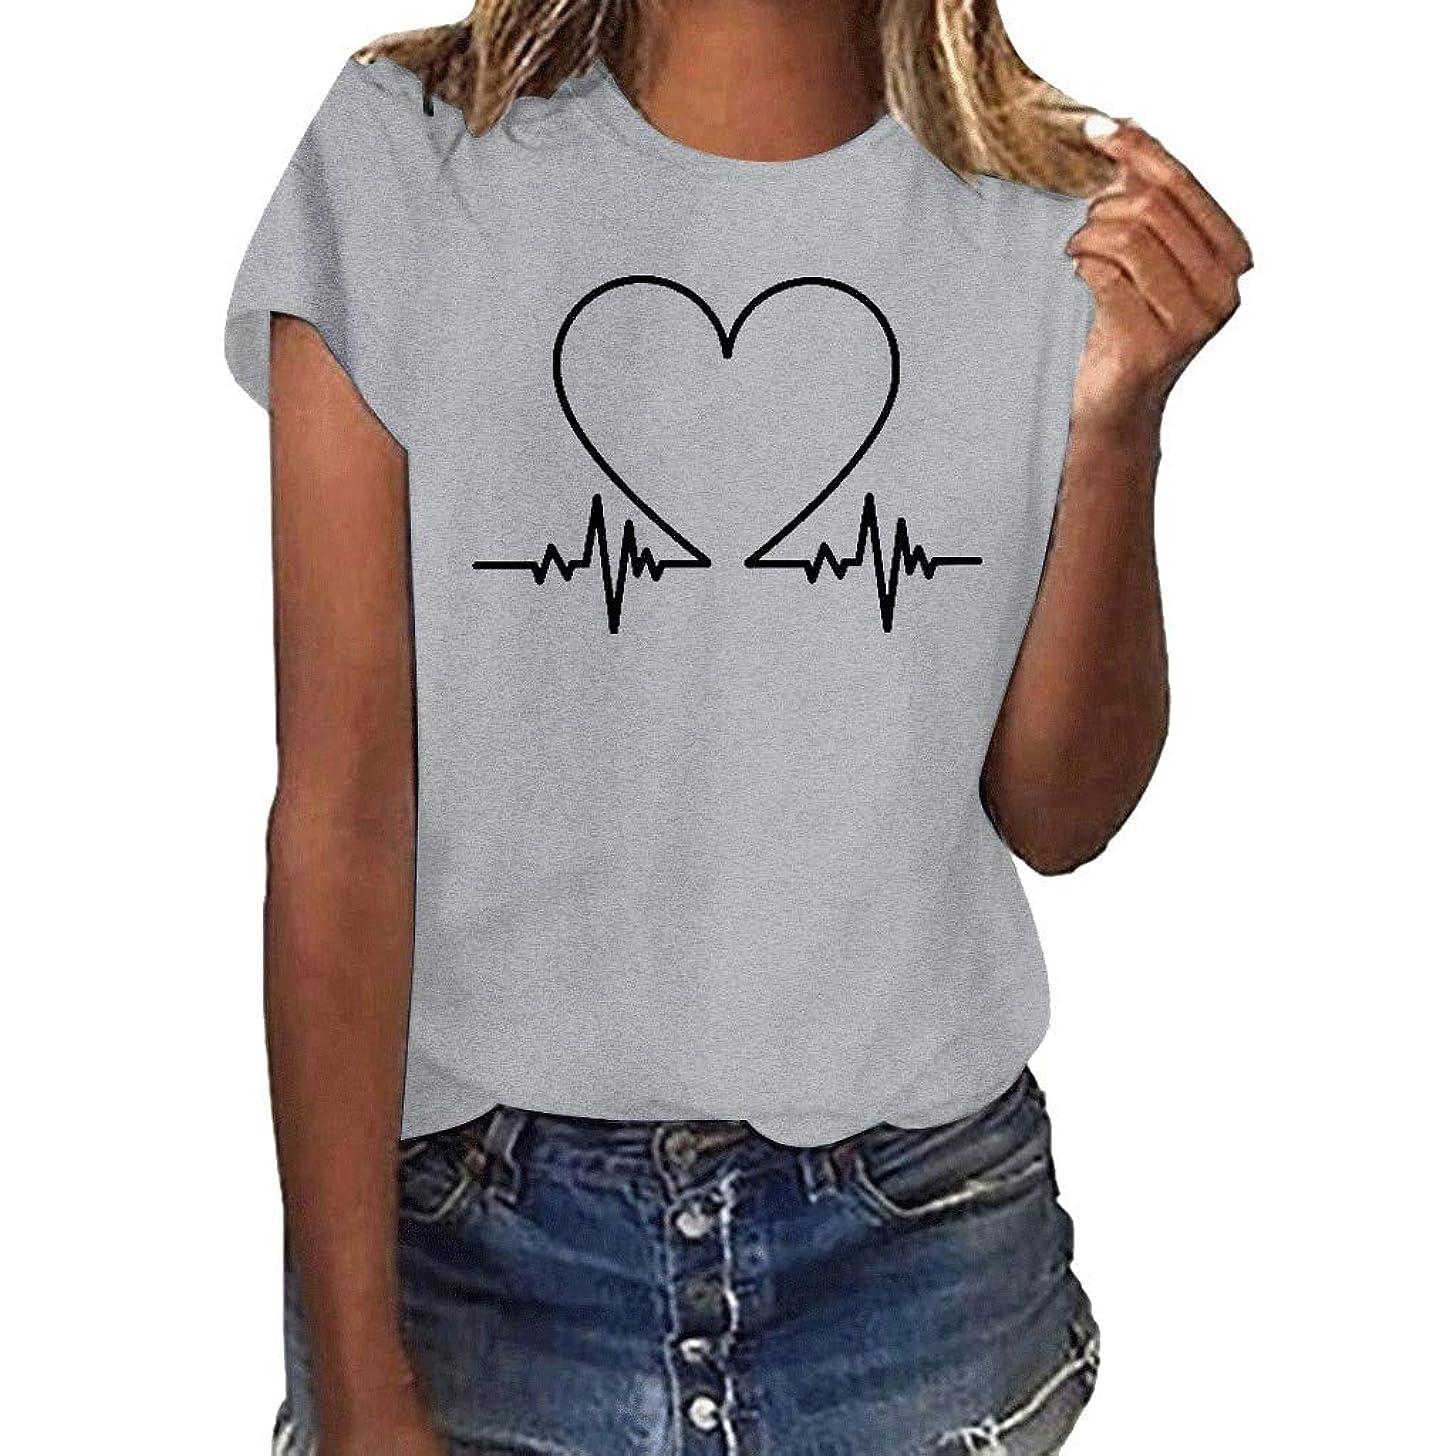 〓COOlCCI〓Women Summer Funny Love Pattern Print Short Sleeve Top Tee Graphic Cute T-Shirt Cute Juniors Tops Teen Girl